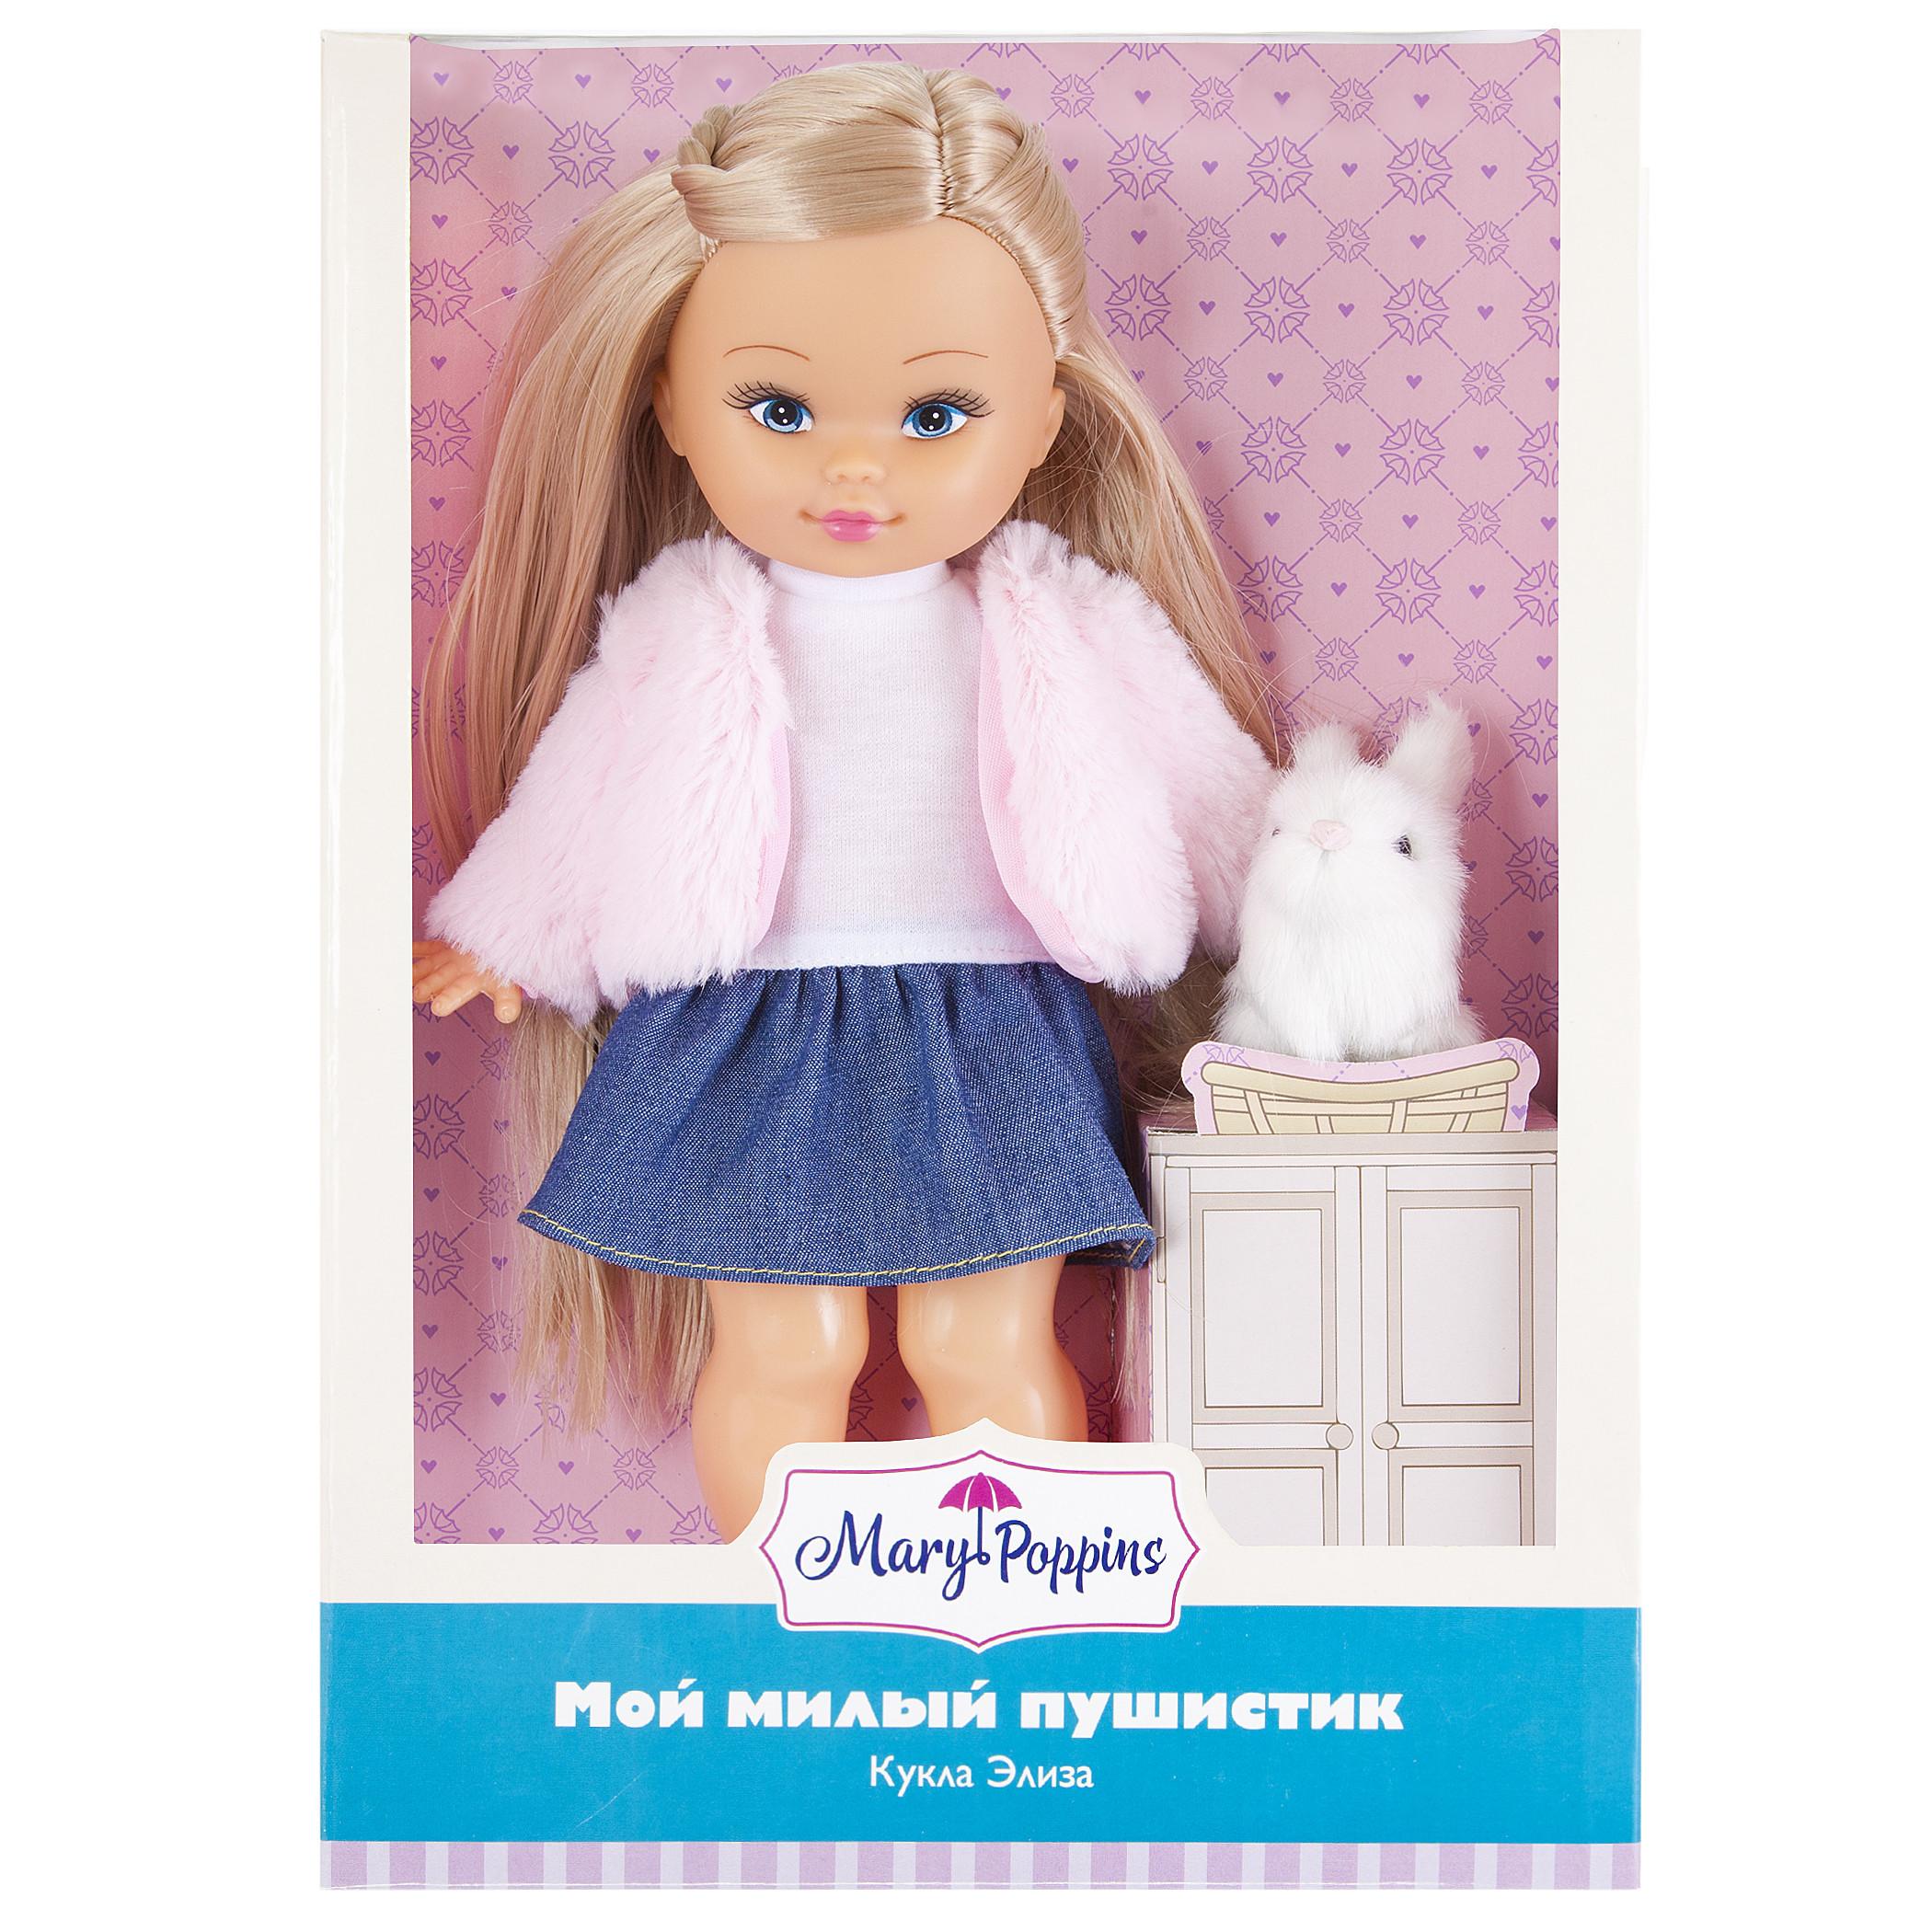 Кукла Наша игрушка Элиза: Мой милый пушистик с зайкой кукла mary poppins элиза мой милый пушистик зайка